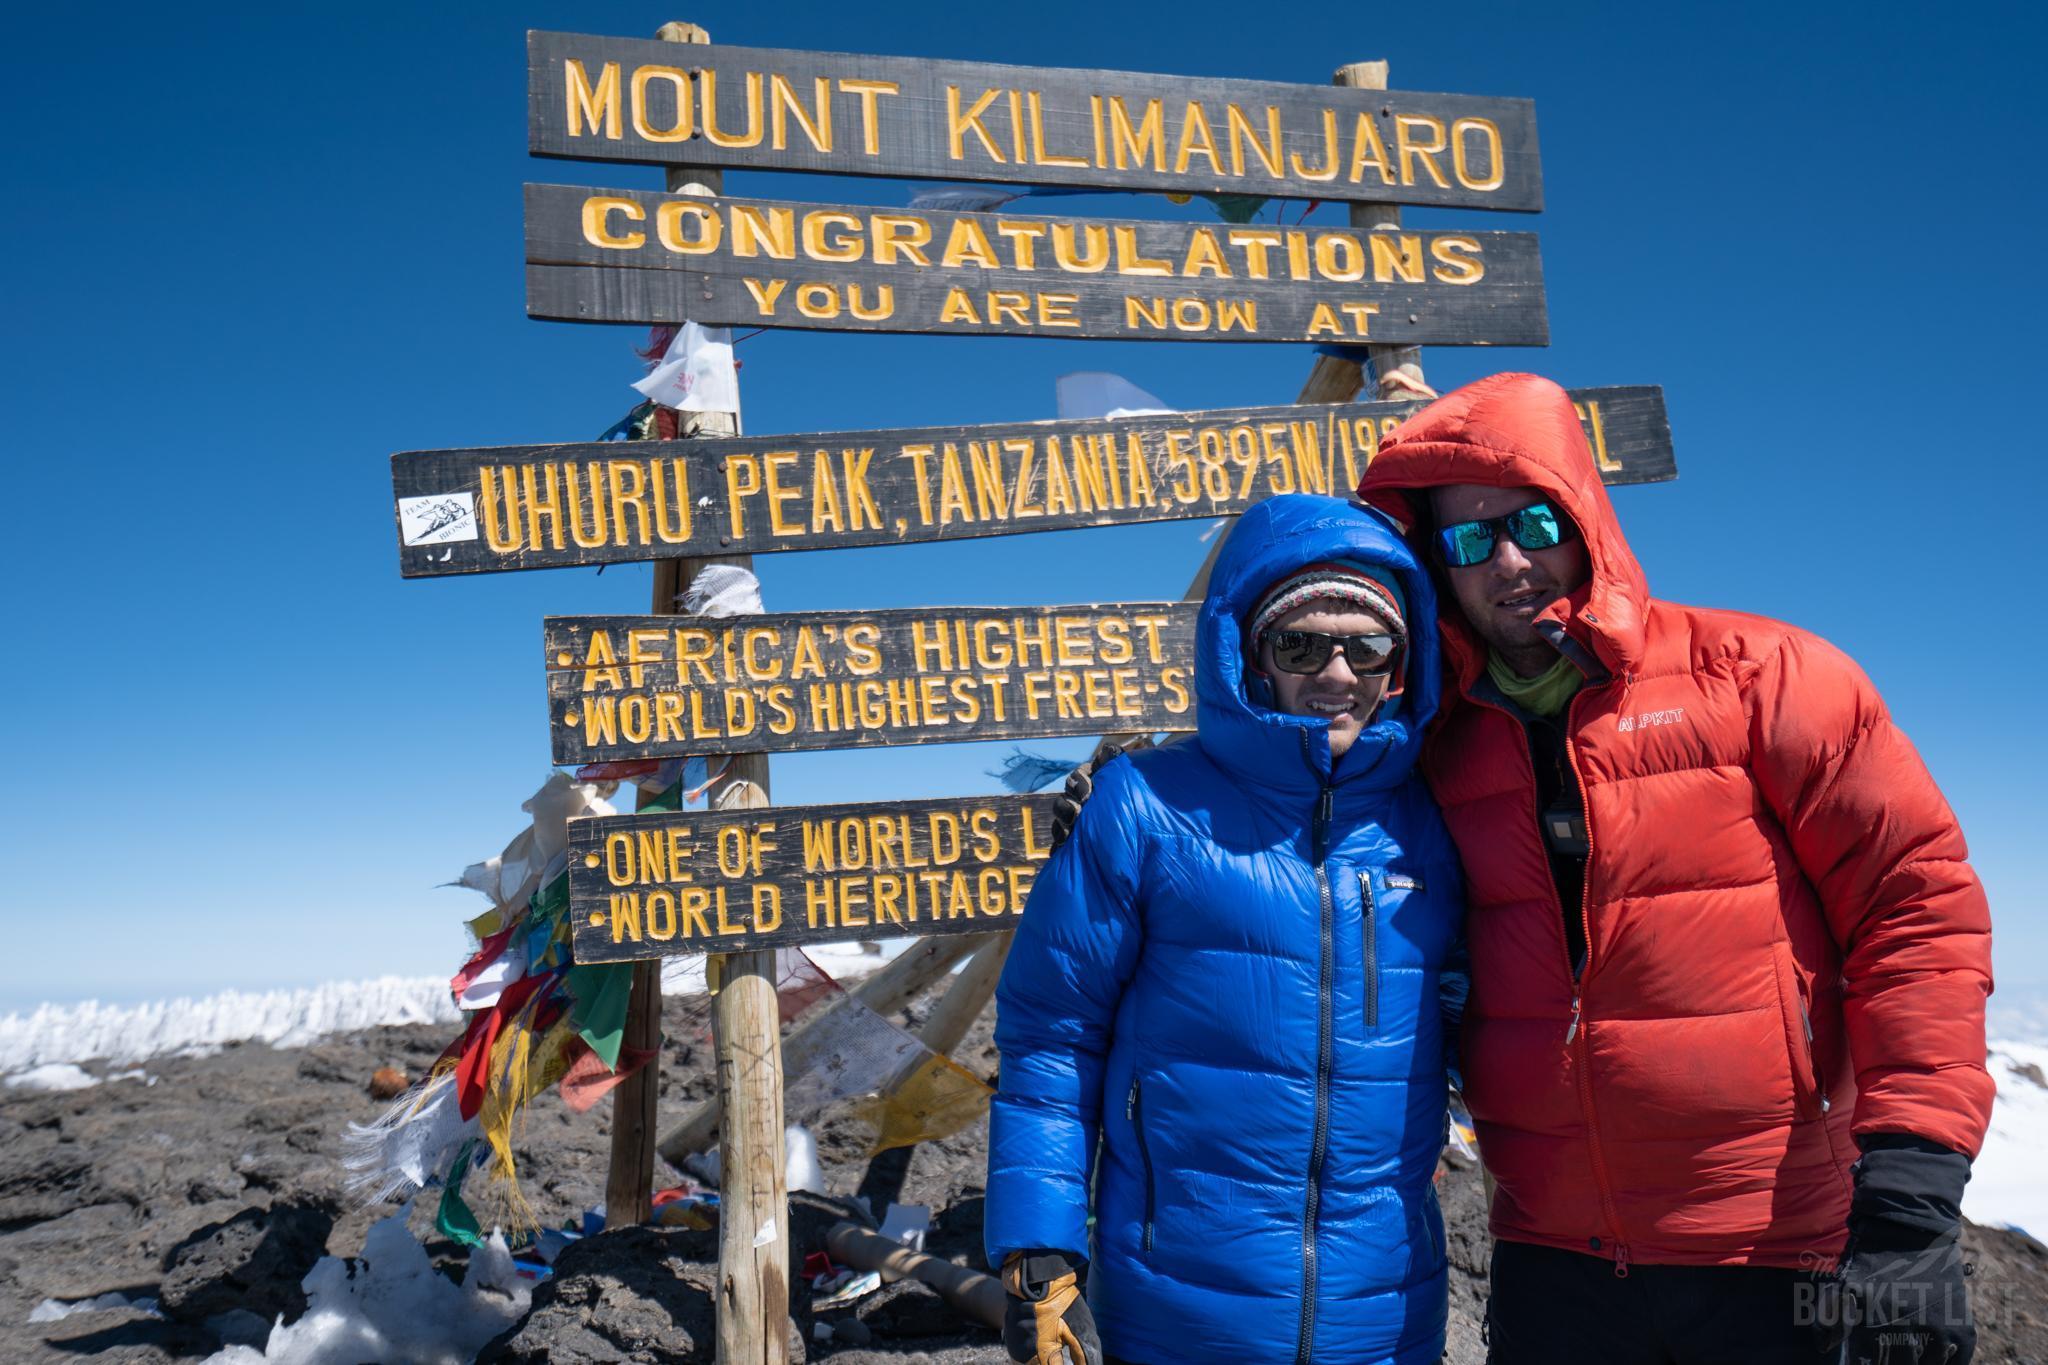 Twi trekkers at the Kilimanjaro summit